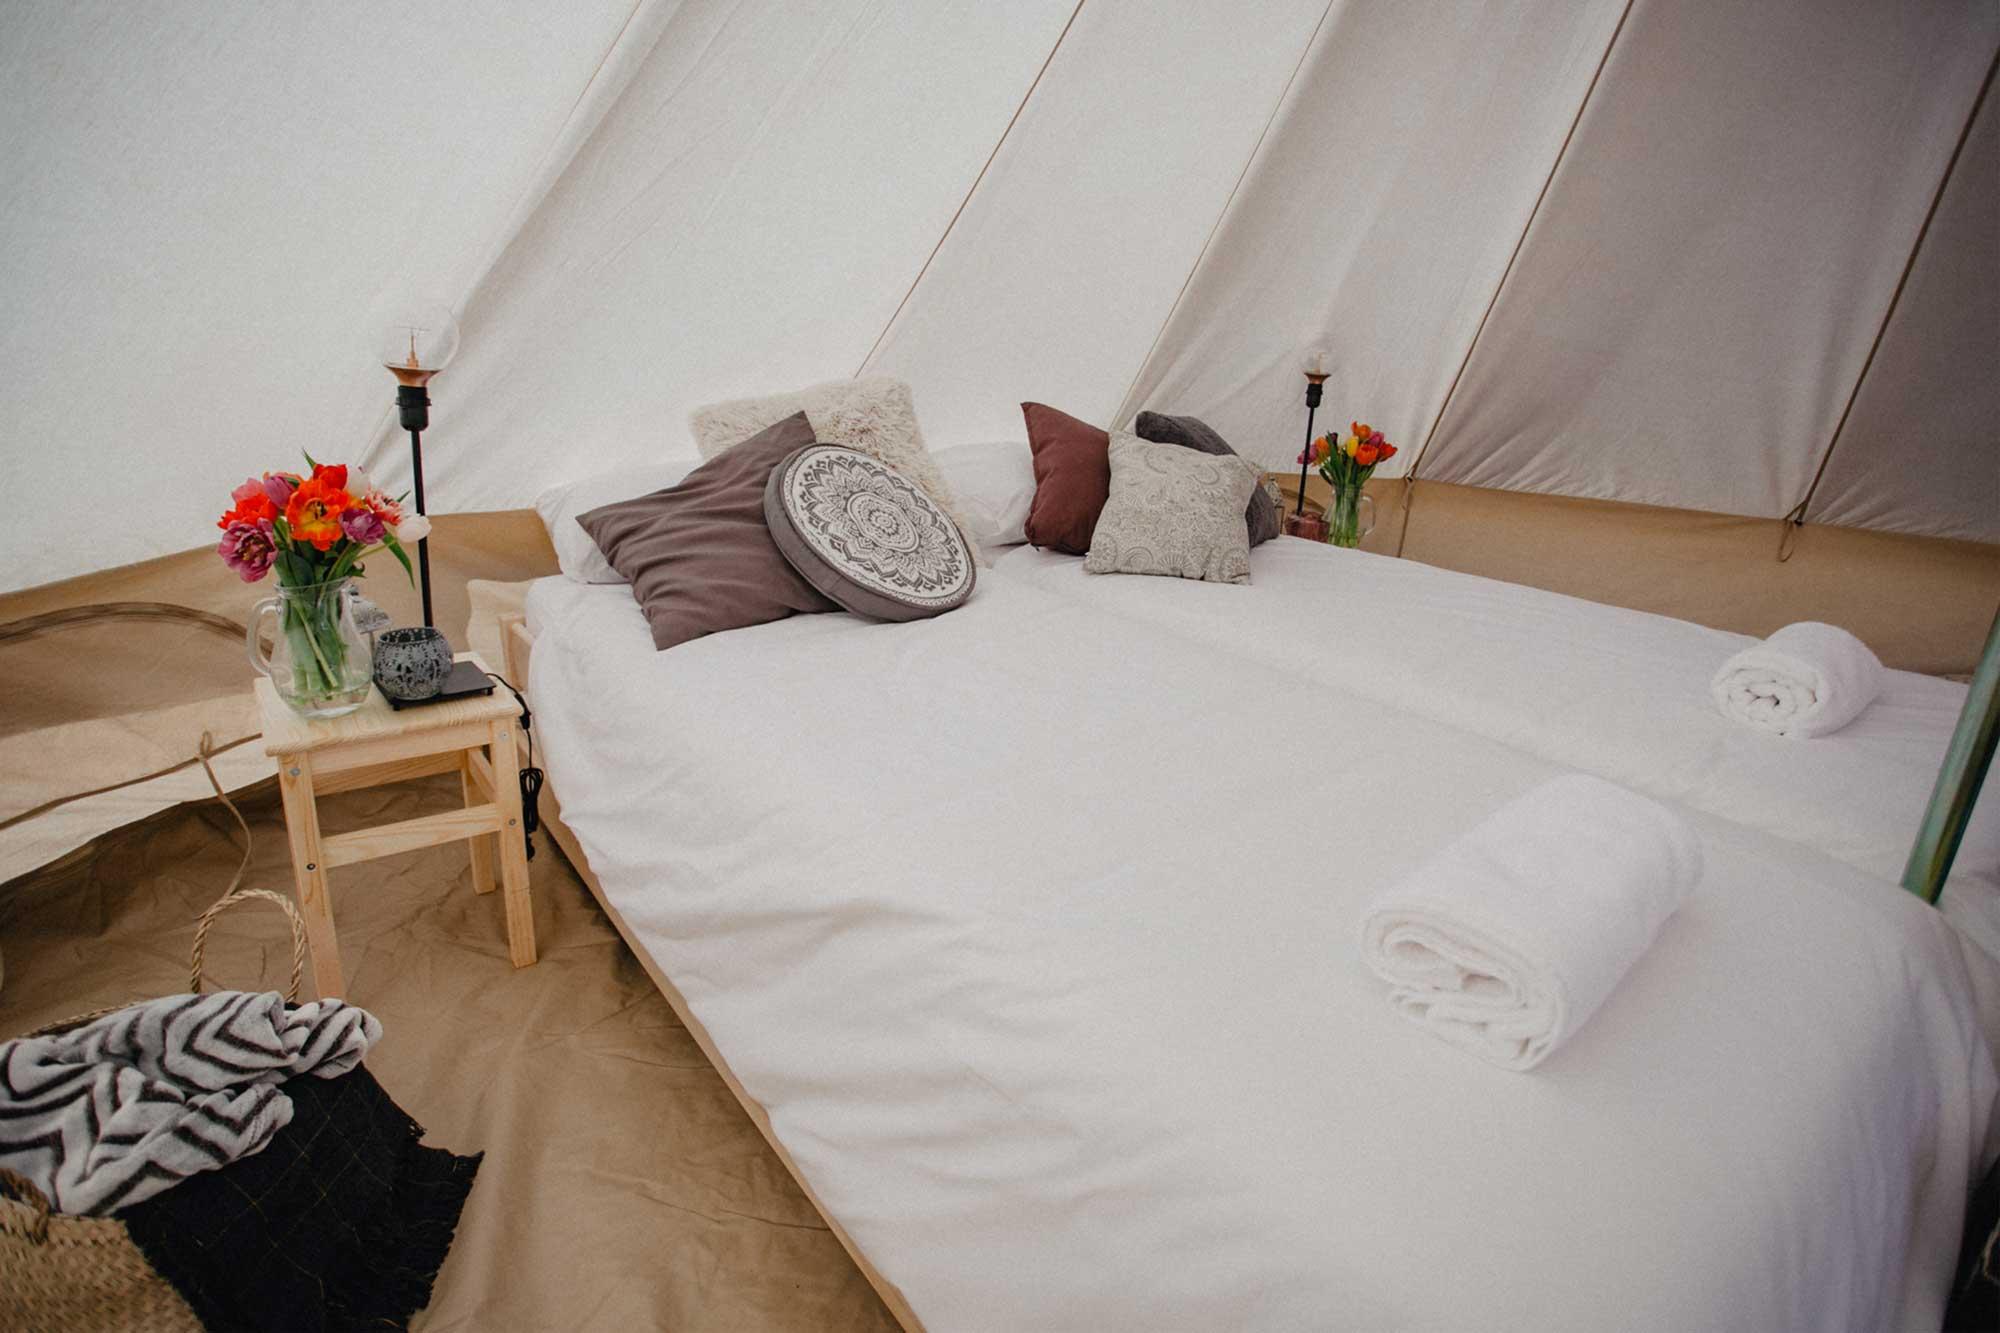 Tickets + The Garden Resort - Glamping Tent